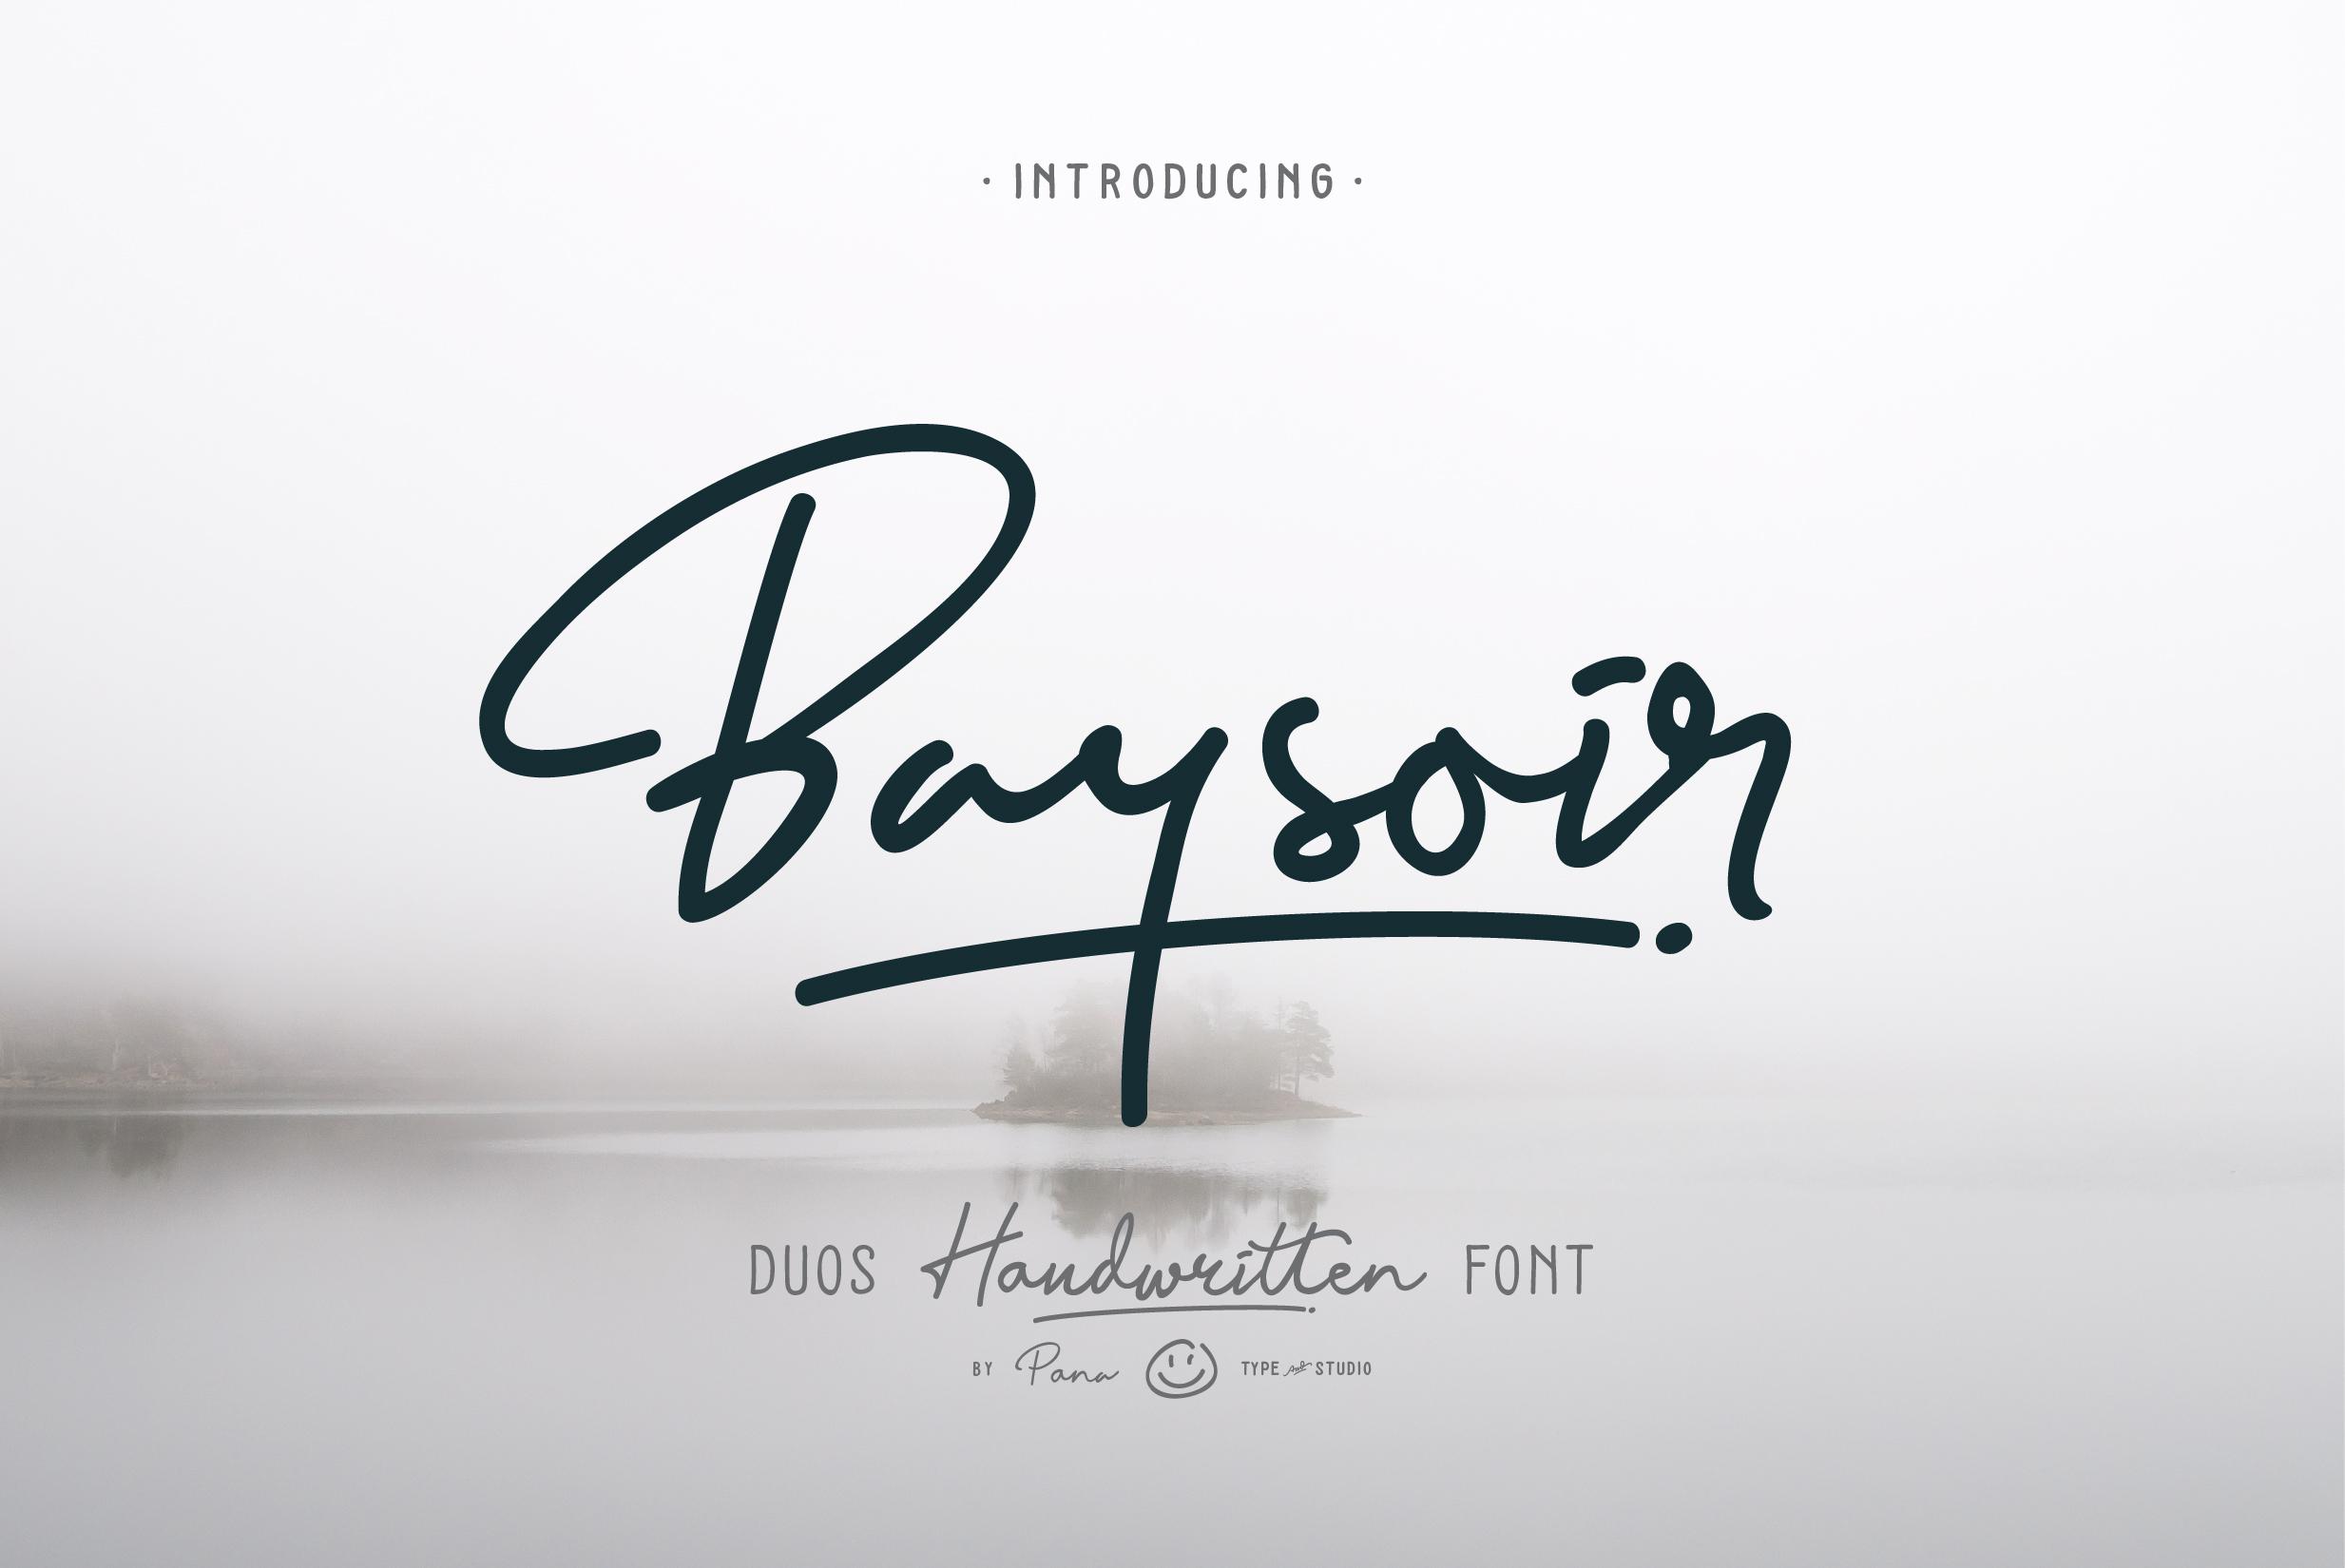 baysoir duo handwritten font by panatype